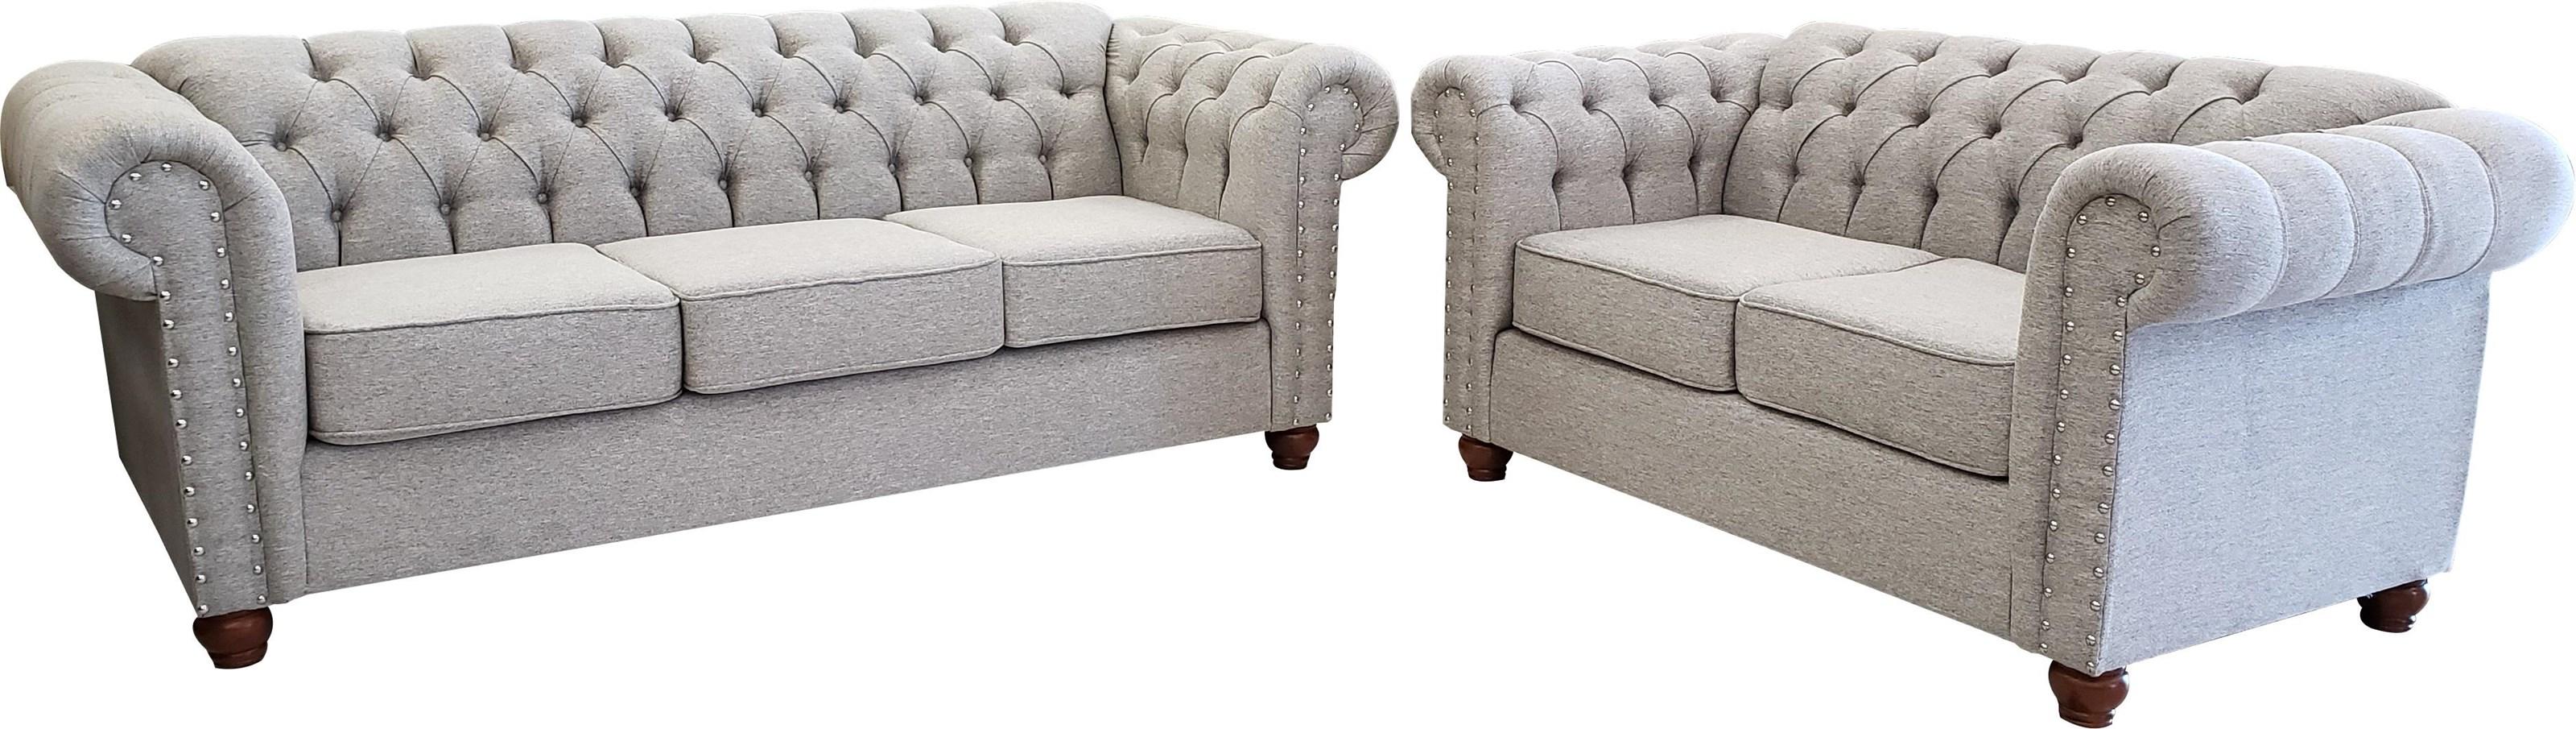 900 2pc Set Madison Silver by Phoenix Custom Furniture at Del Sol Furniture